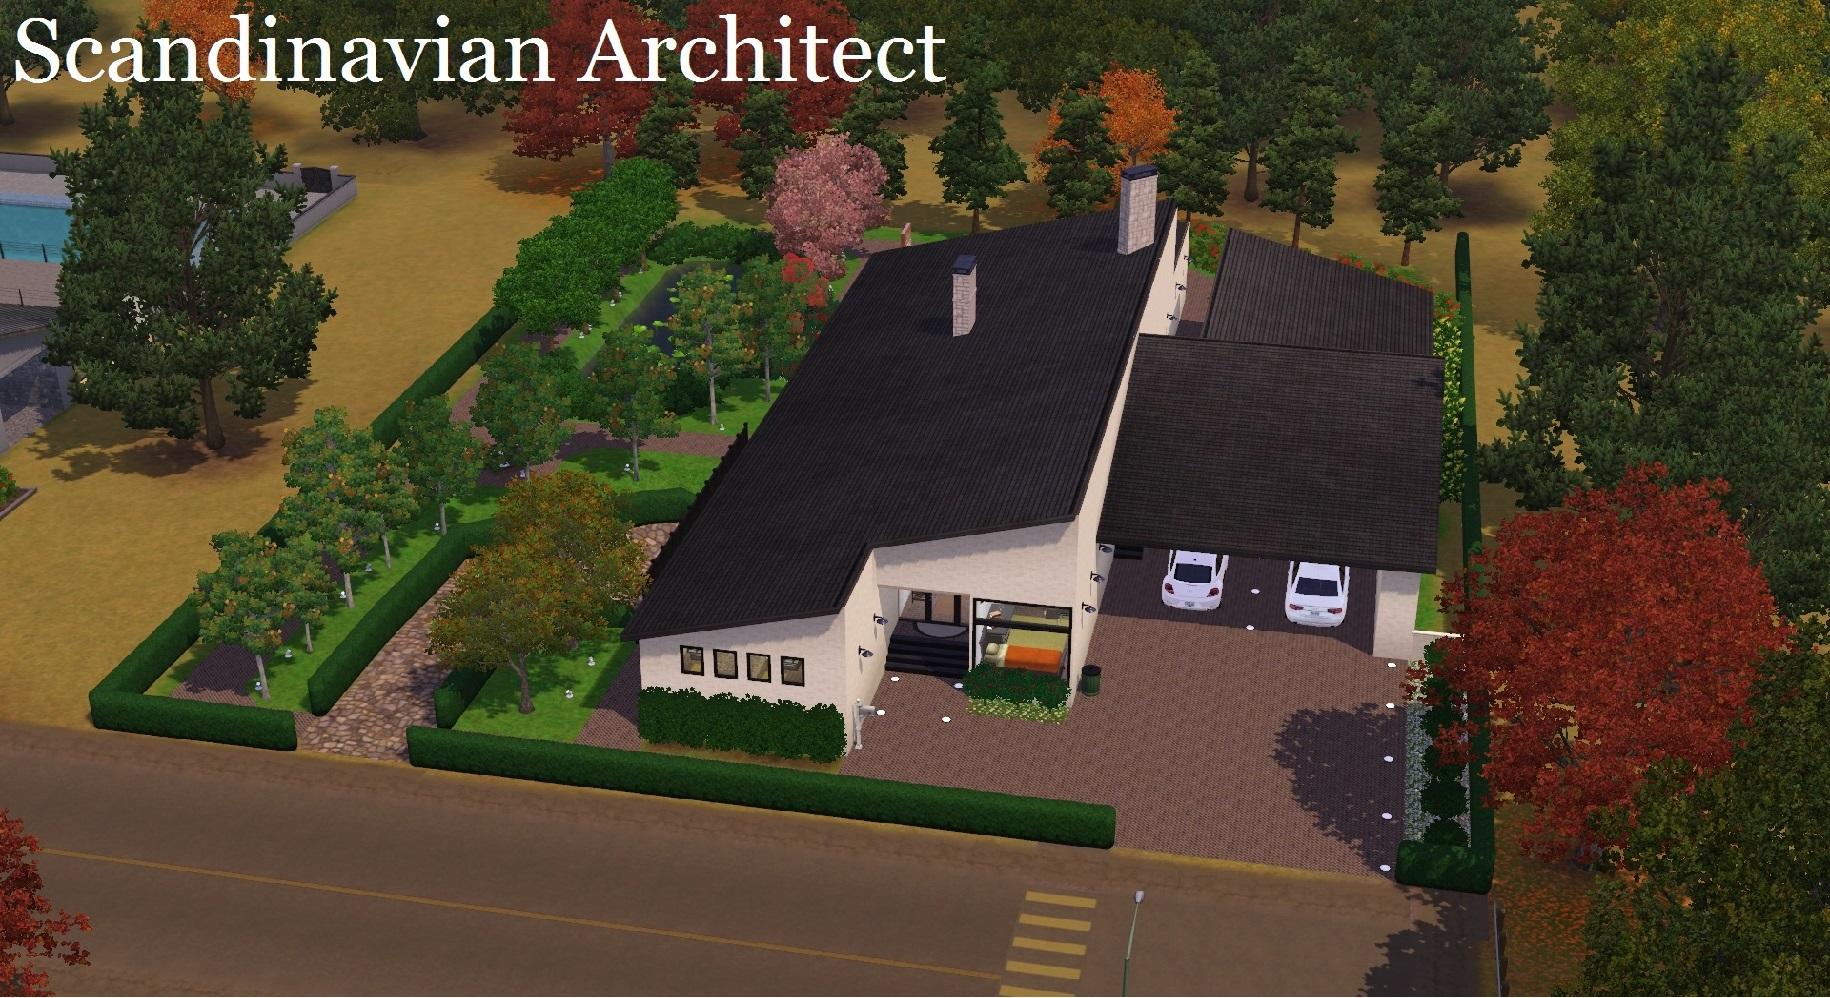 70s modern scandinavian architect designed house